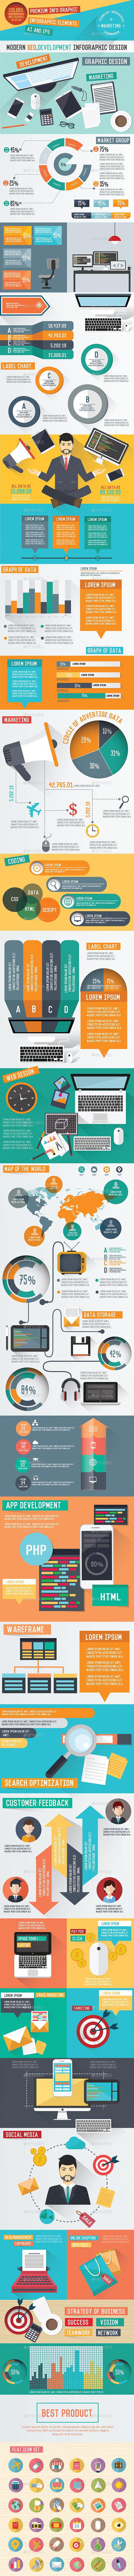 Marketing SEO Infographic design